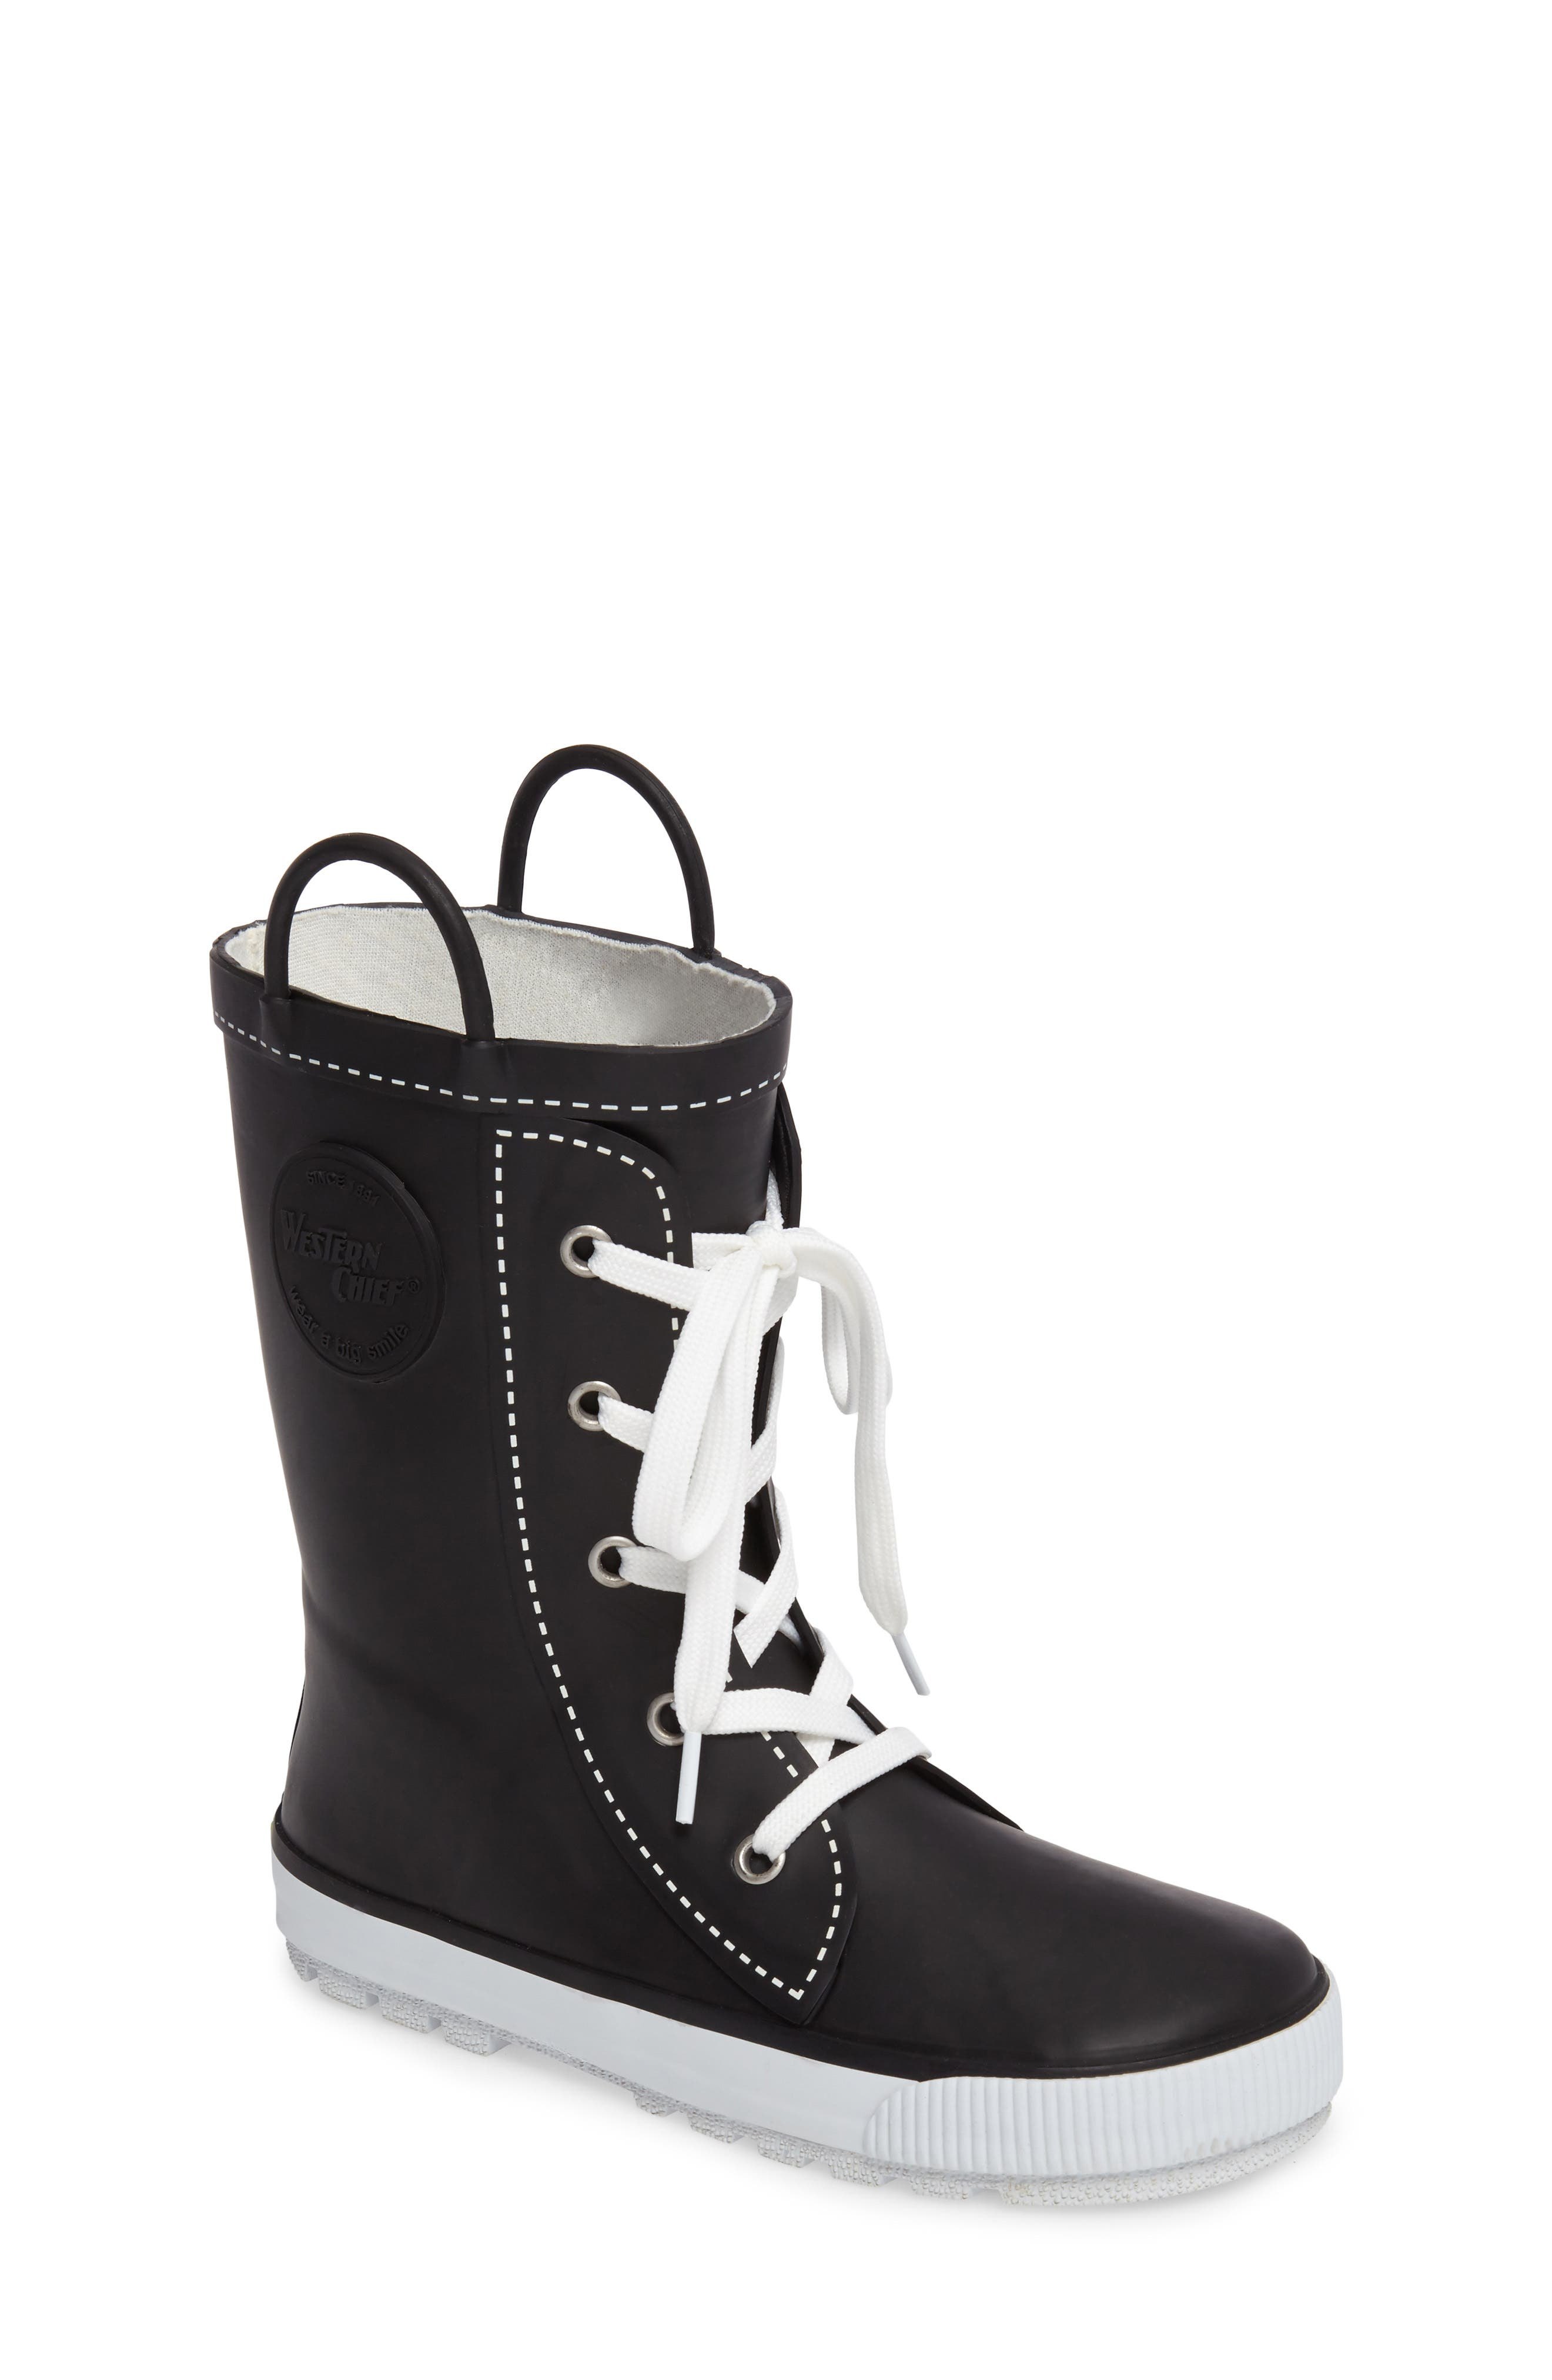 Waterproof Sneaker Rain Boot,                             Main thumbnail 1, color,                             001